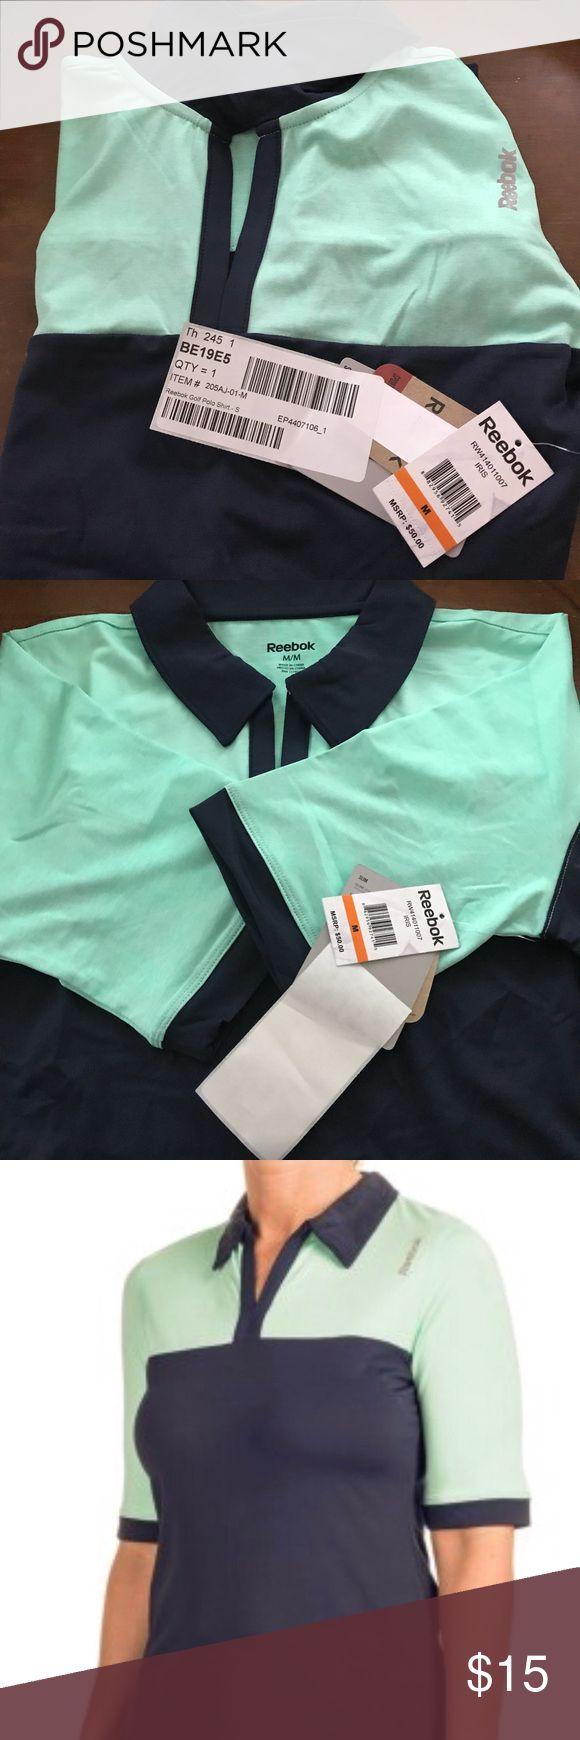 reebok tennis shirt